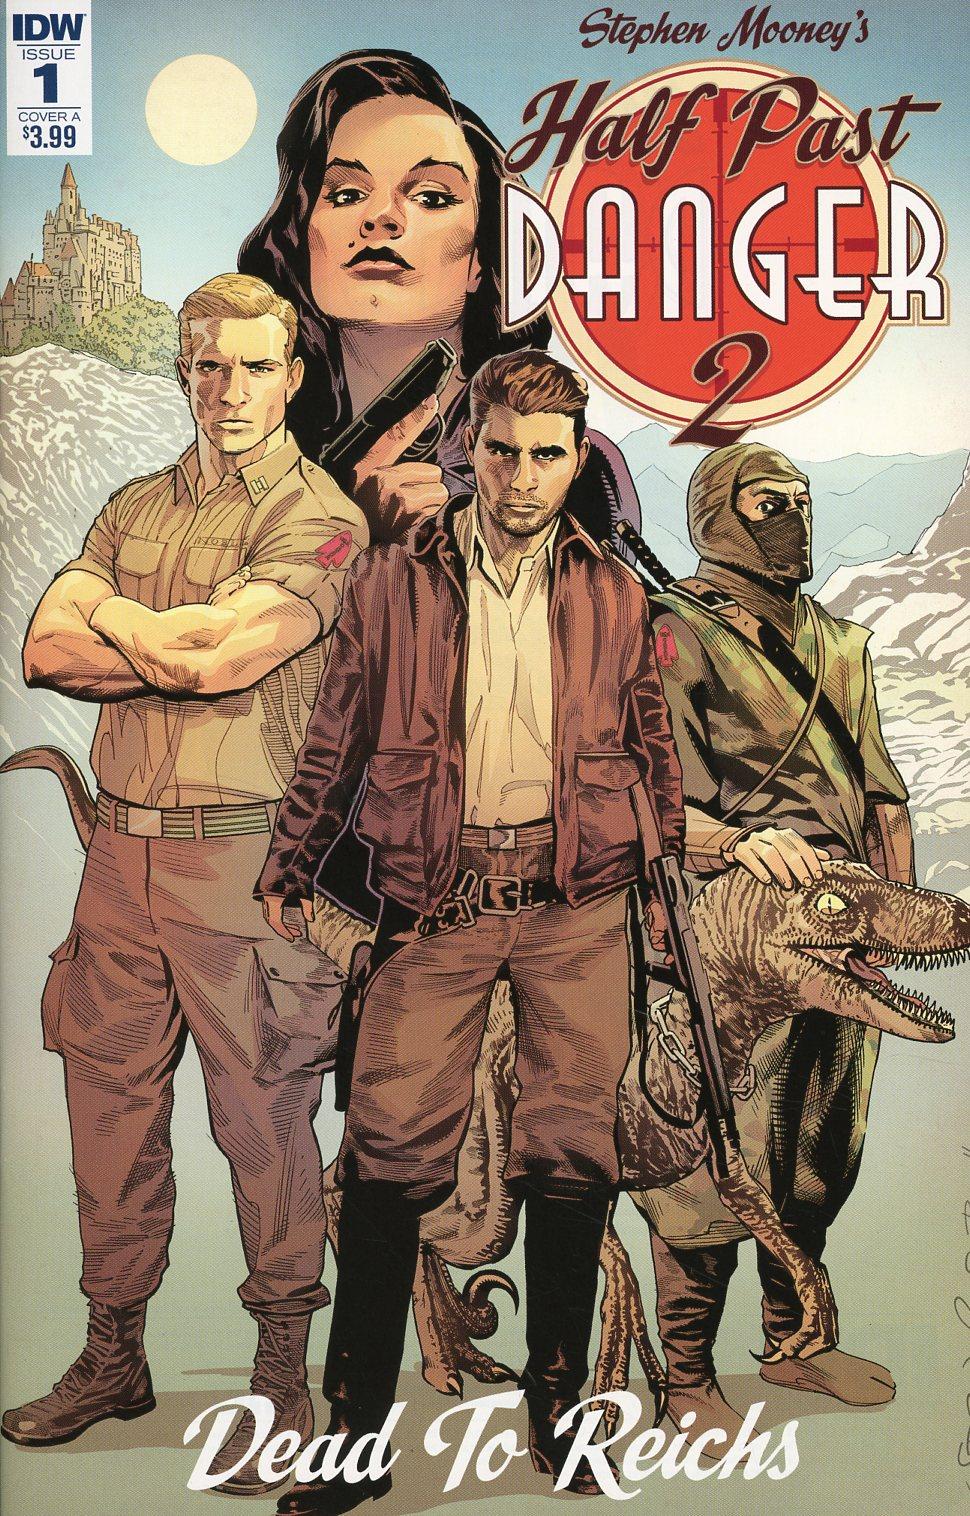 Half Past Danger II Dead To Reichs #1 Cover A Regular Stephen Mooney Cover